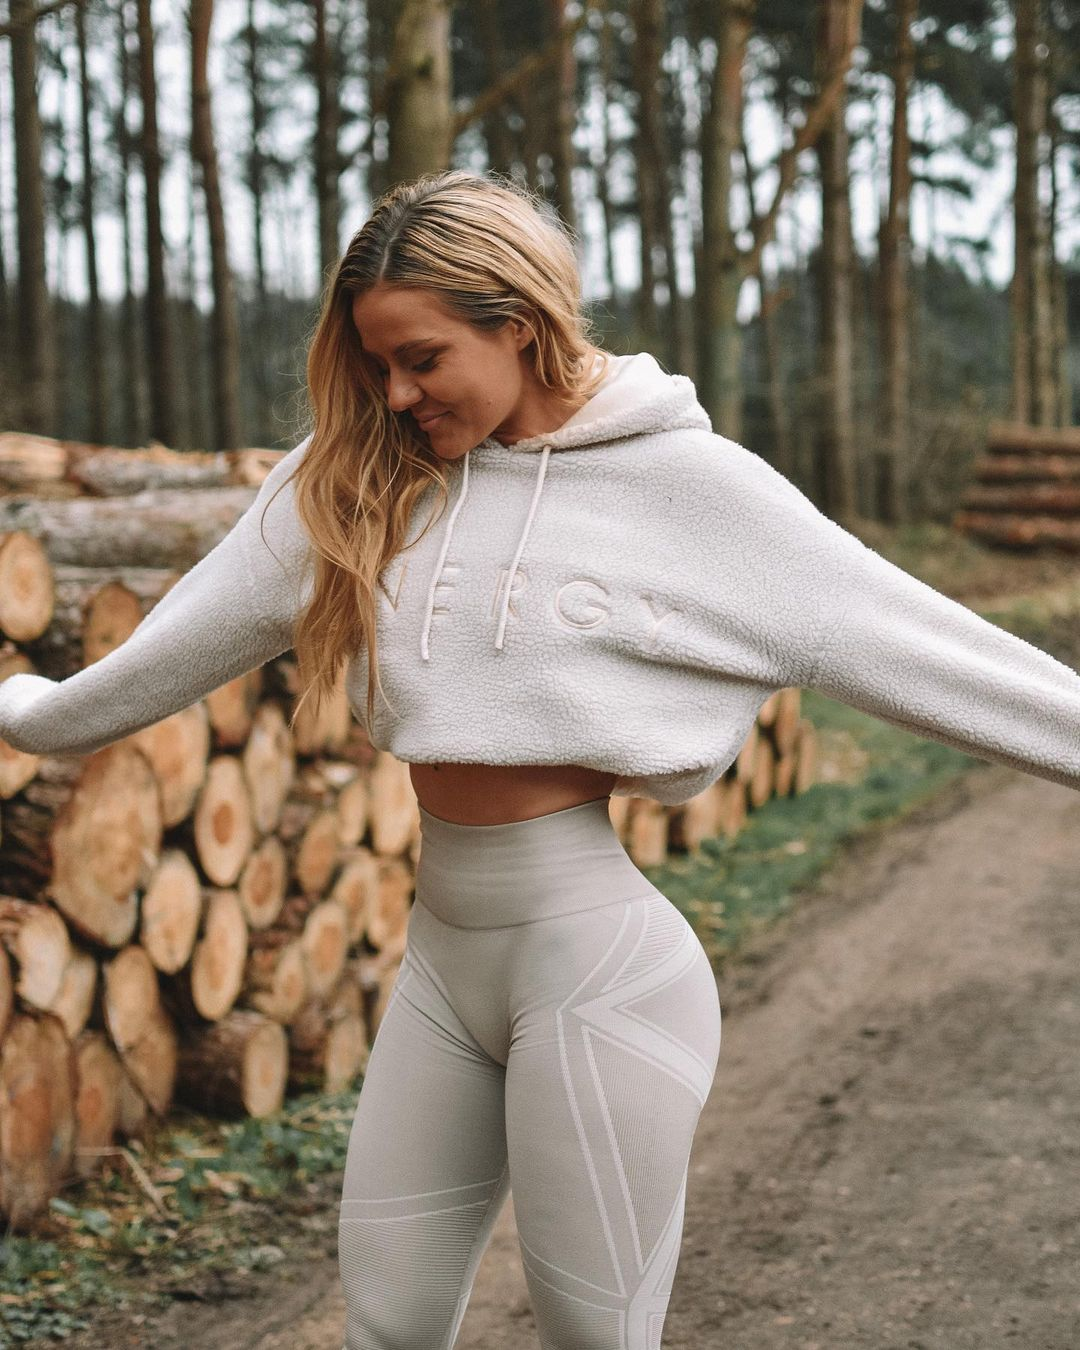 Dominique-Asgeirsdottir-Wallpapers-Insta-Fit-Bio-5